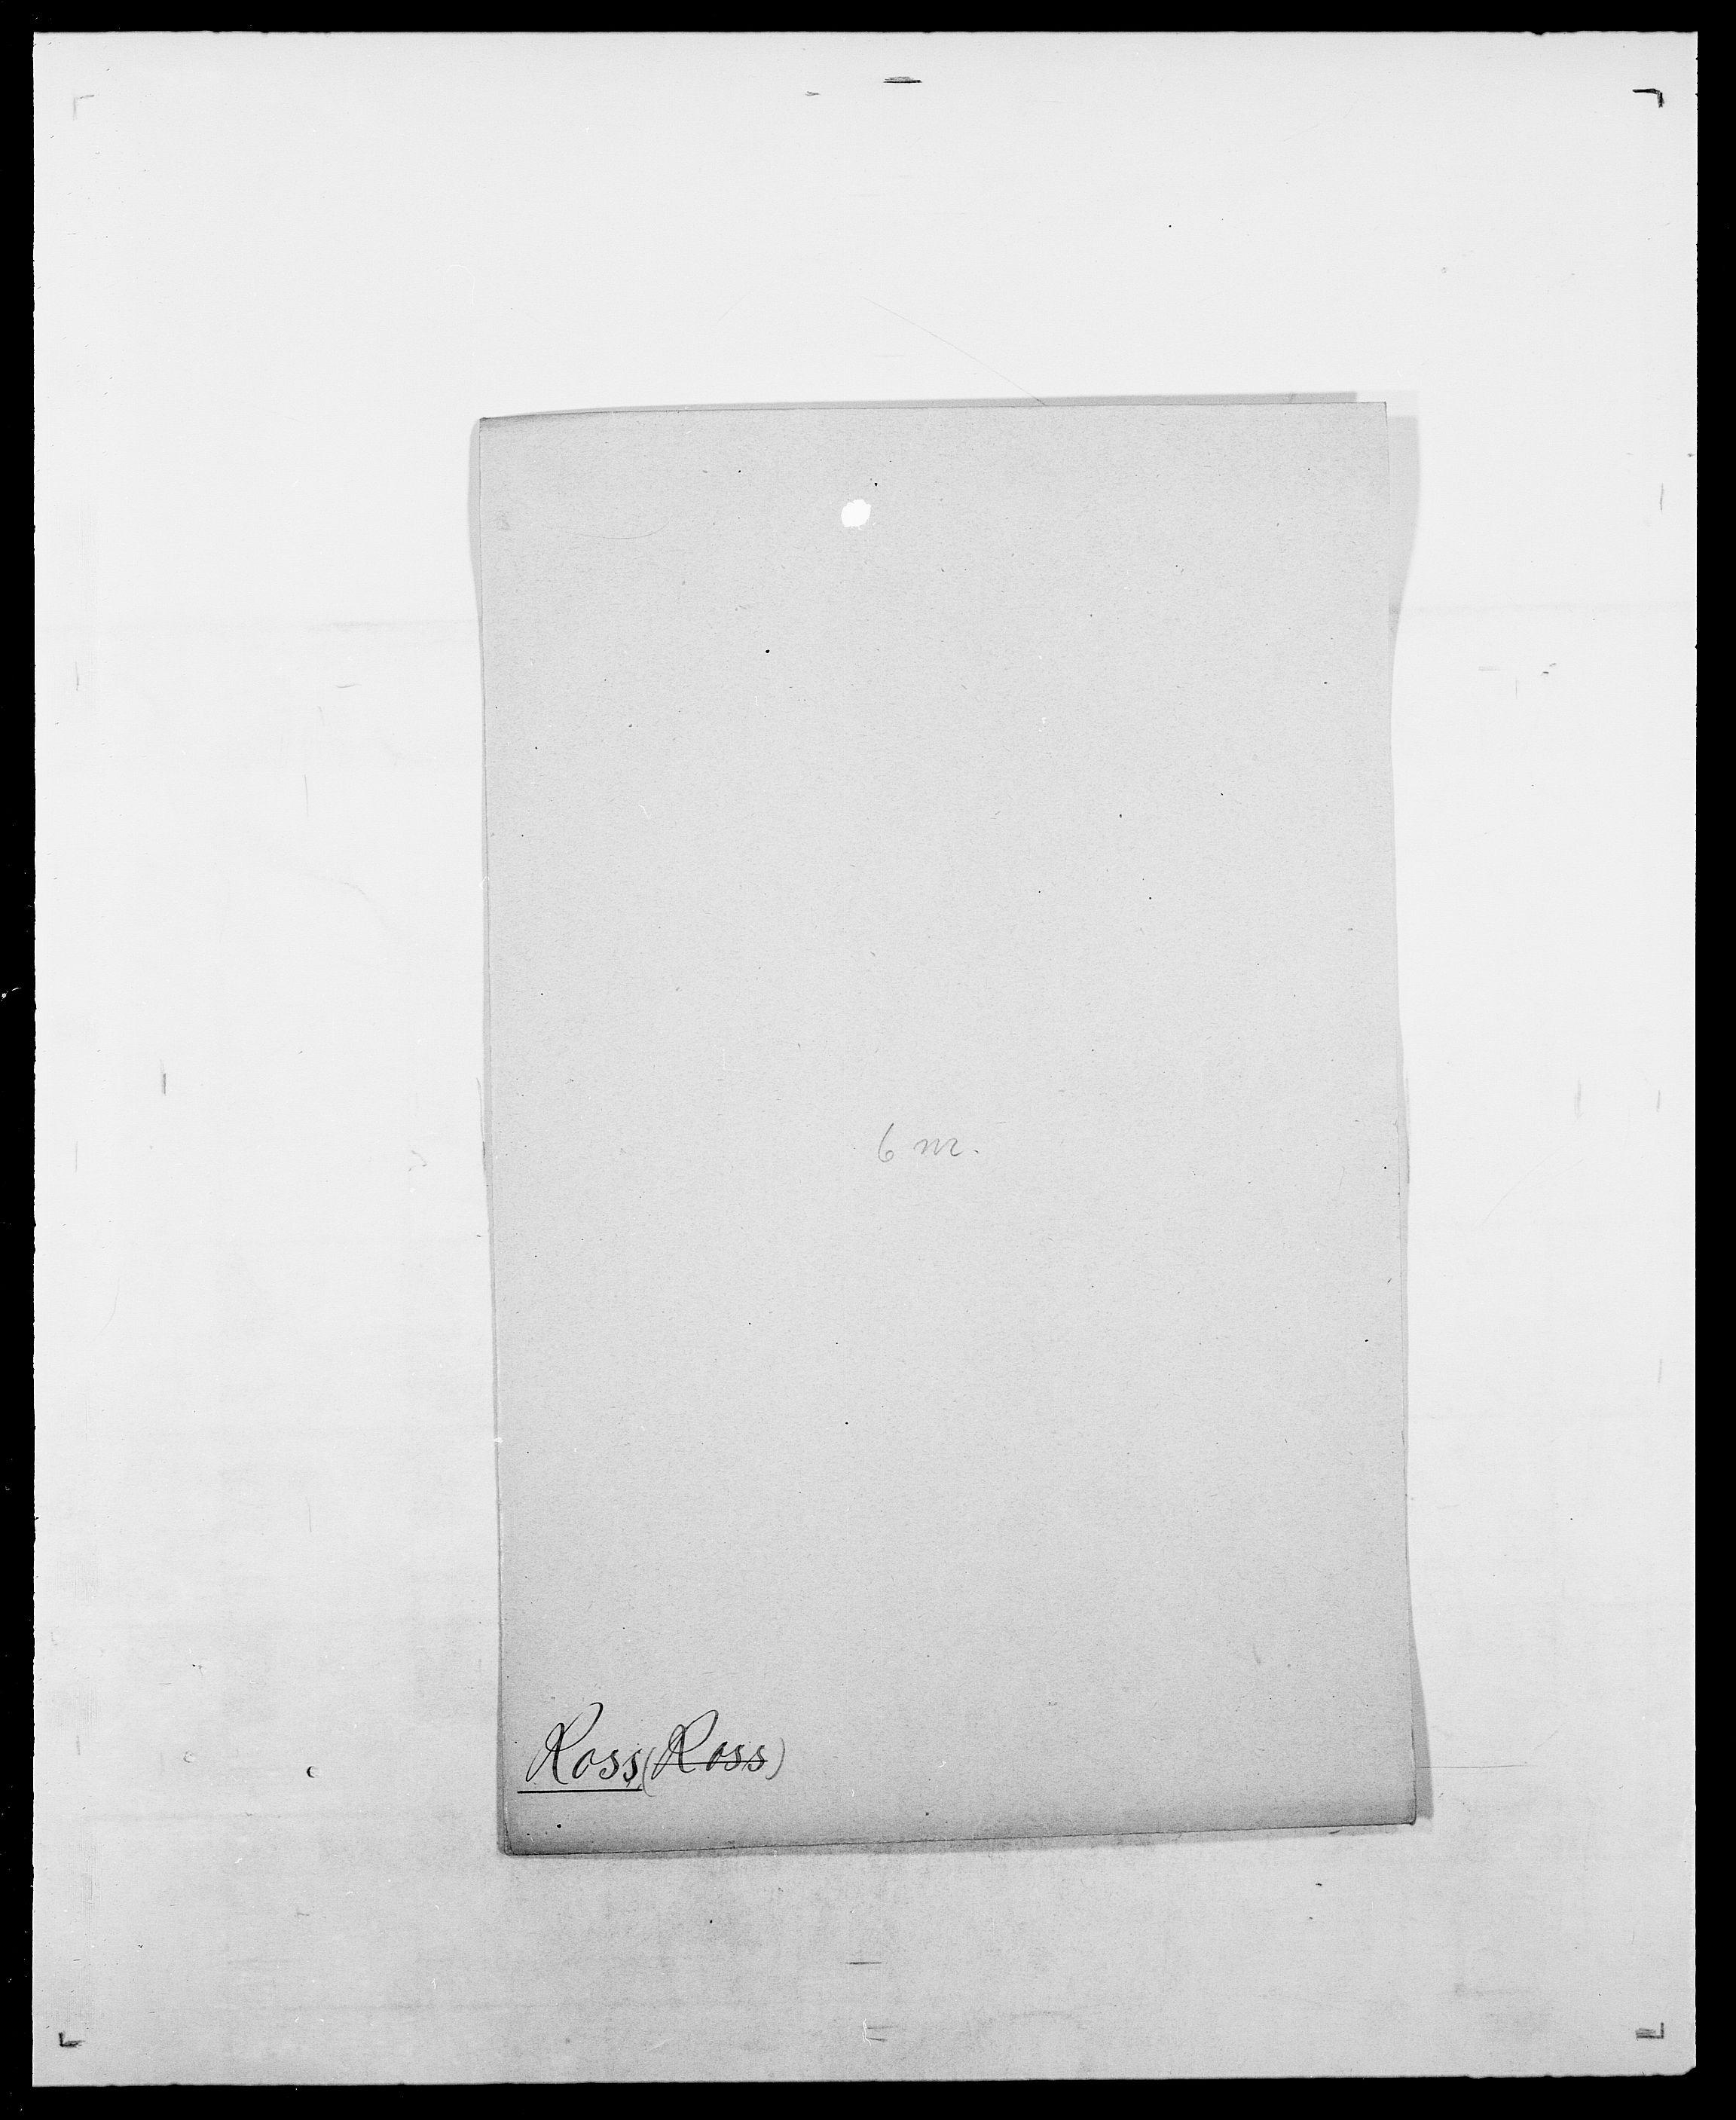 SAO, Delgobe, Charles Antoine - samling, D/Da/L0033: Roald - Røyem, s. 339